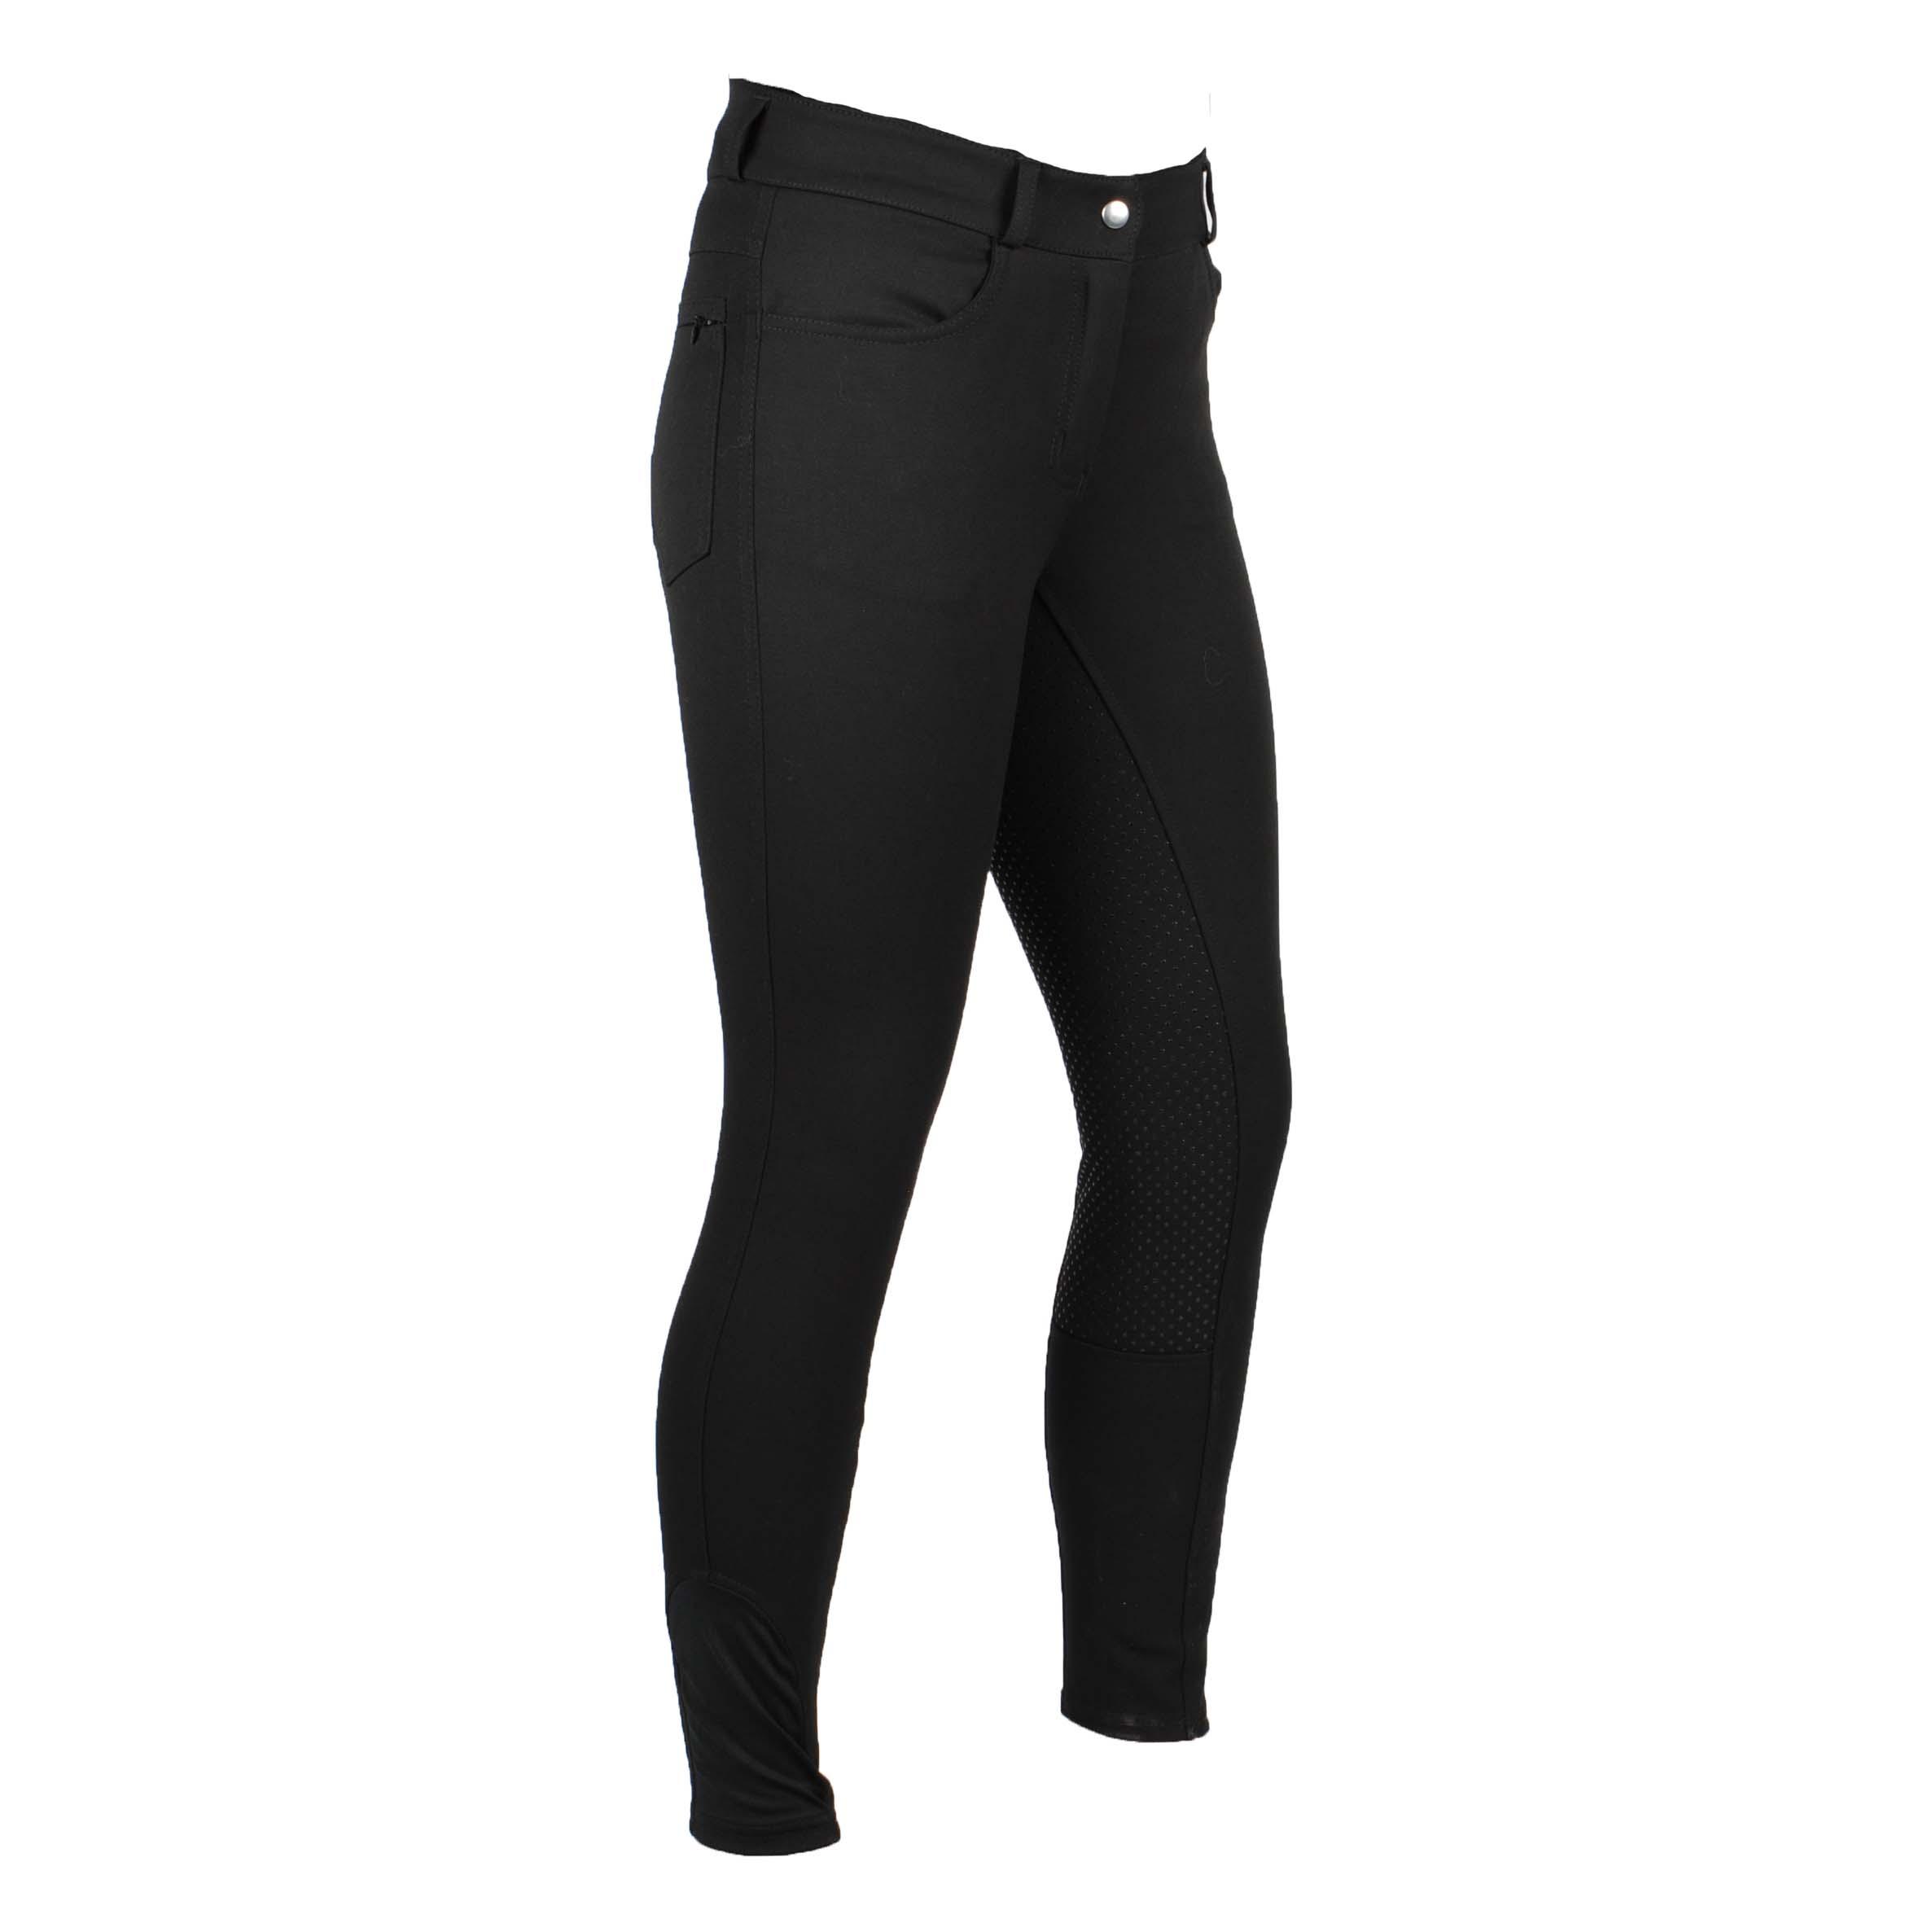 Mondoni Sada high waist full grip rijbroek zwart maat:38